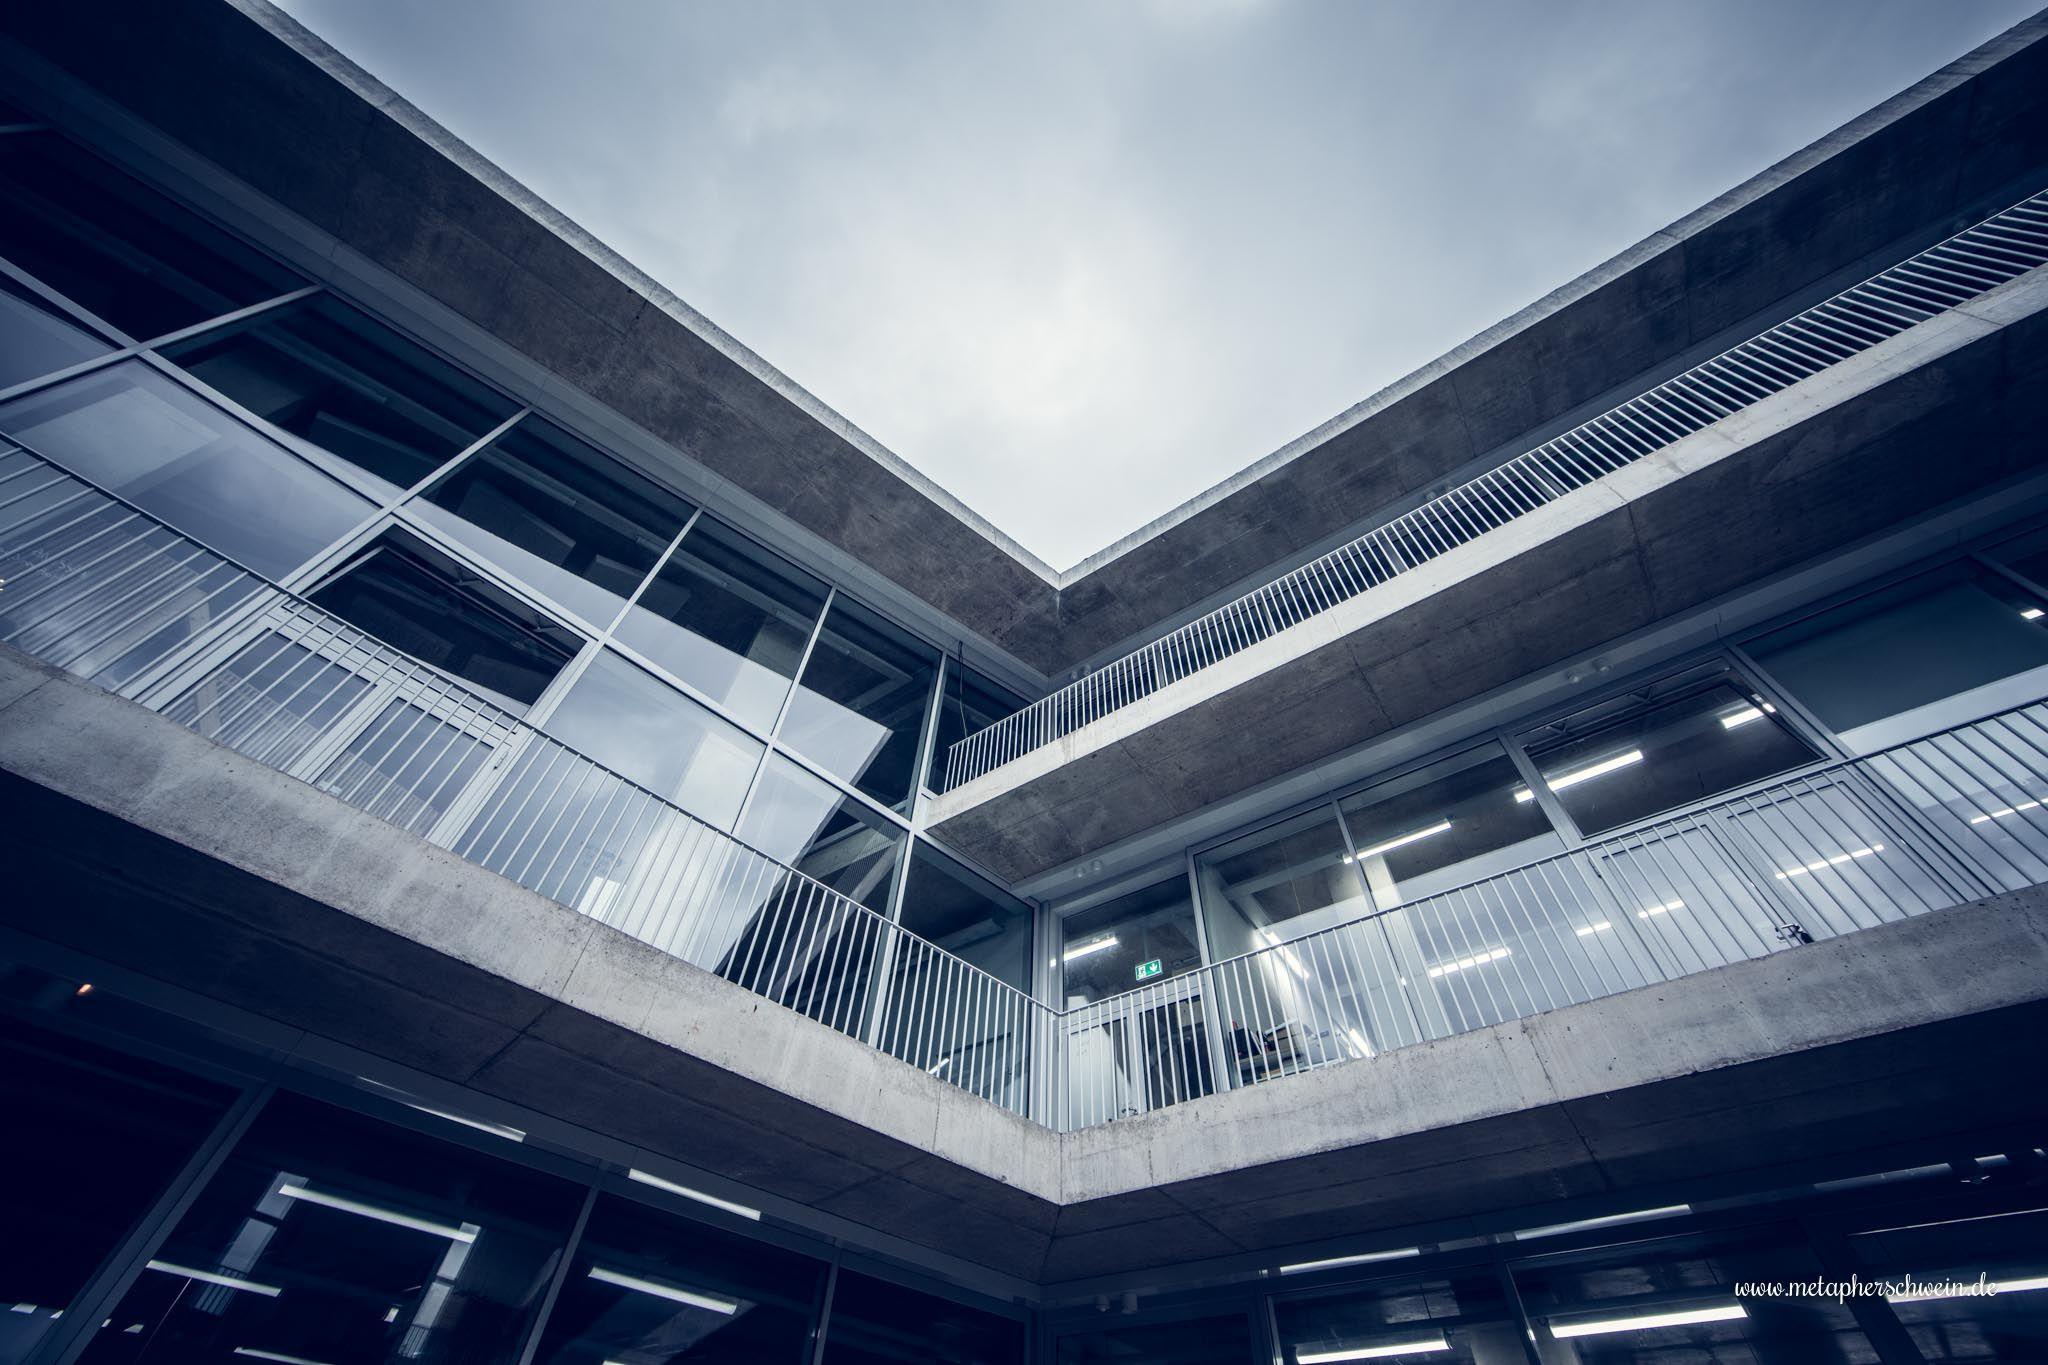 Architekten Hannover hafven hannover 1 mensing timofticiuc architekten gbr